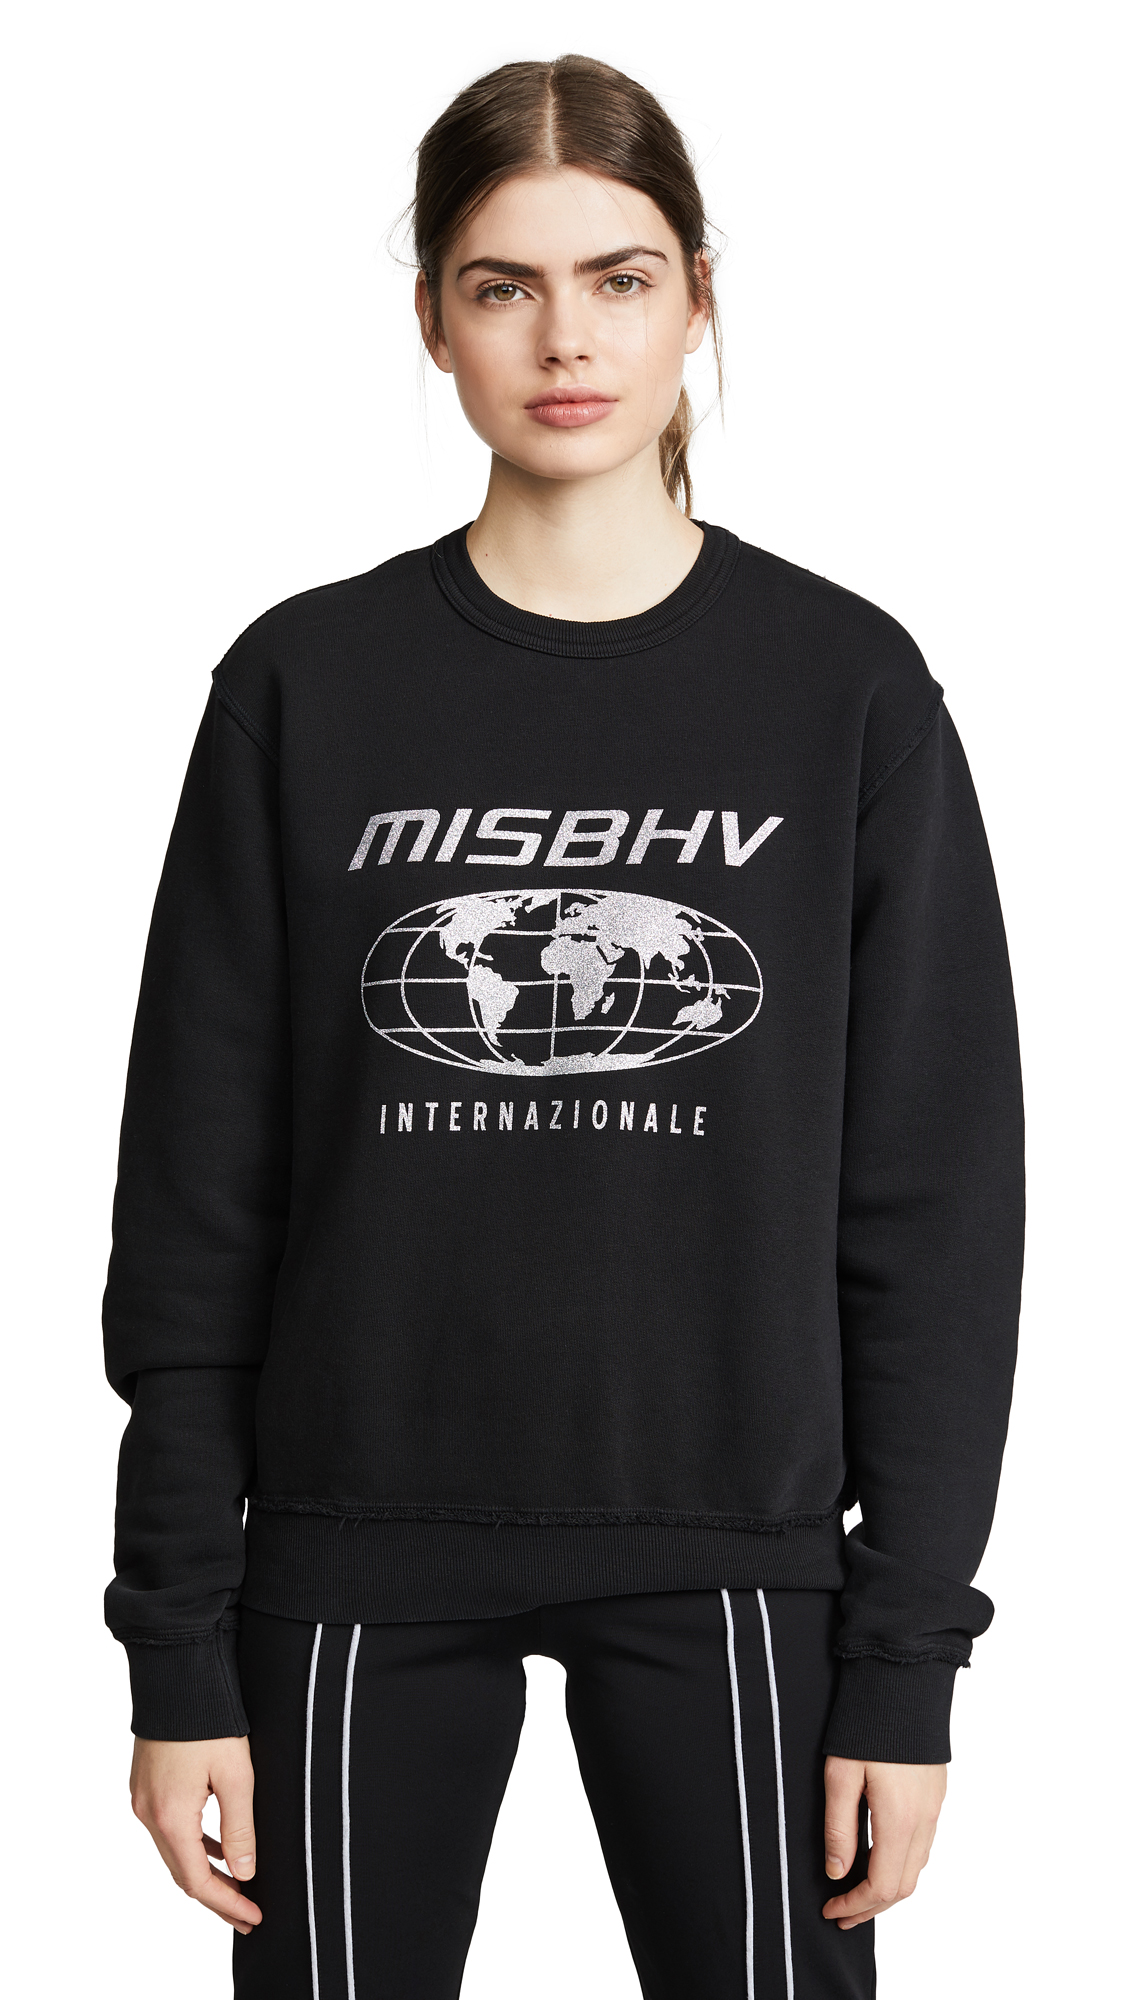 M I S B H V INTERNAZIONALE SWEATSHIRT